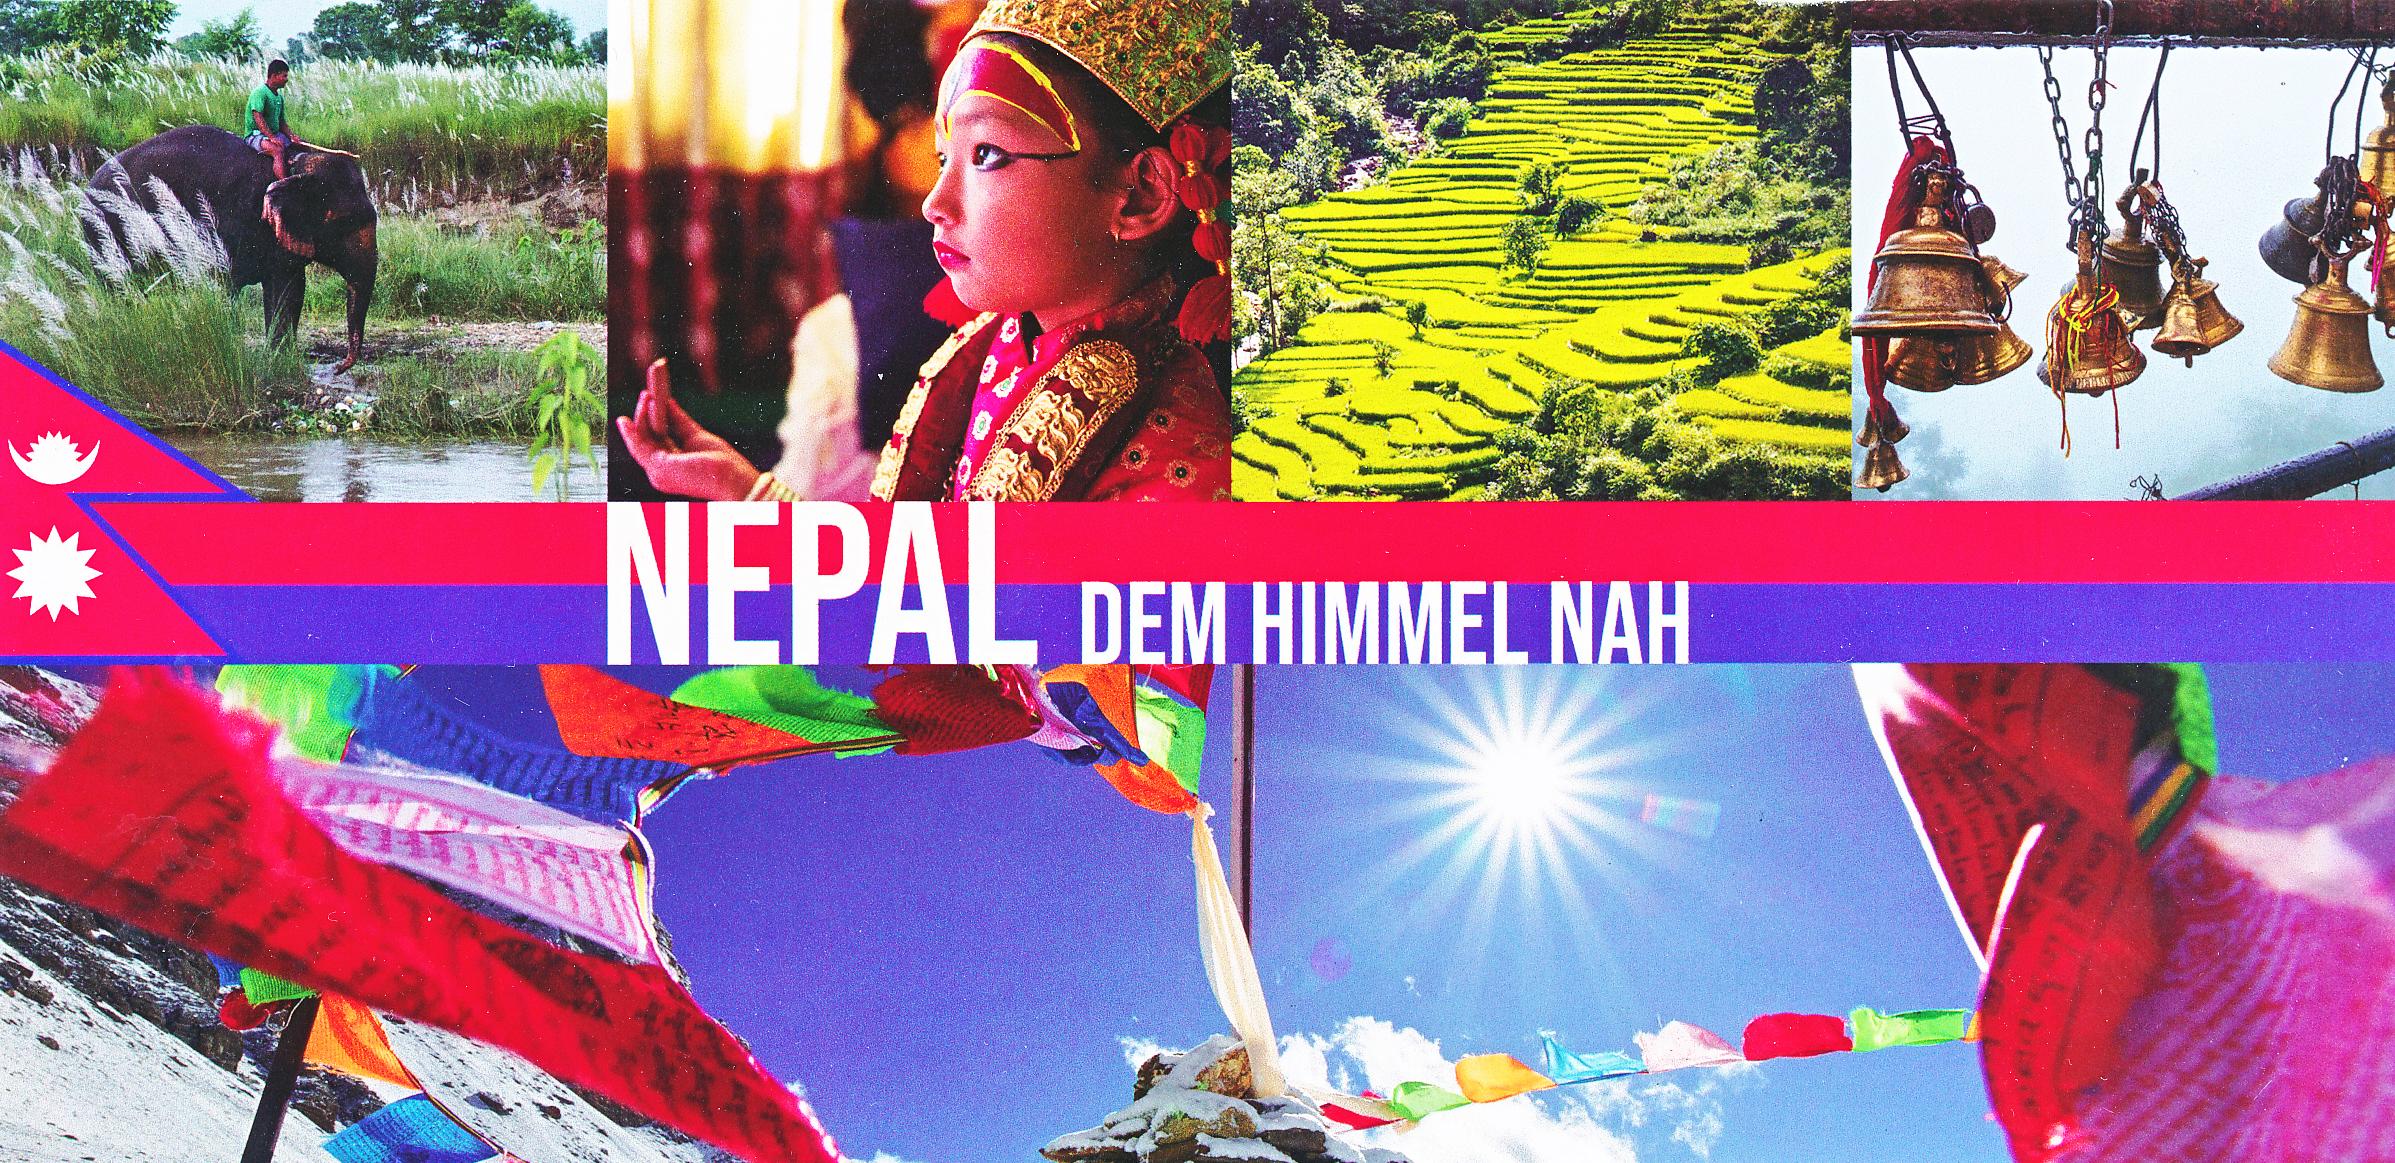 "++Programmtipp++ Tom kommentiert am 04.09. Dokureihe ""Nepal – Dem Himmel so nah"" auf arte"